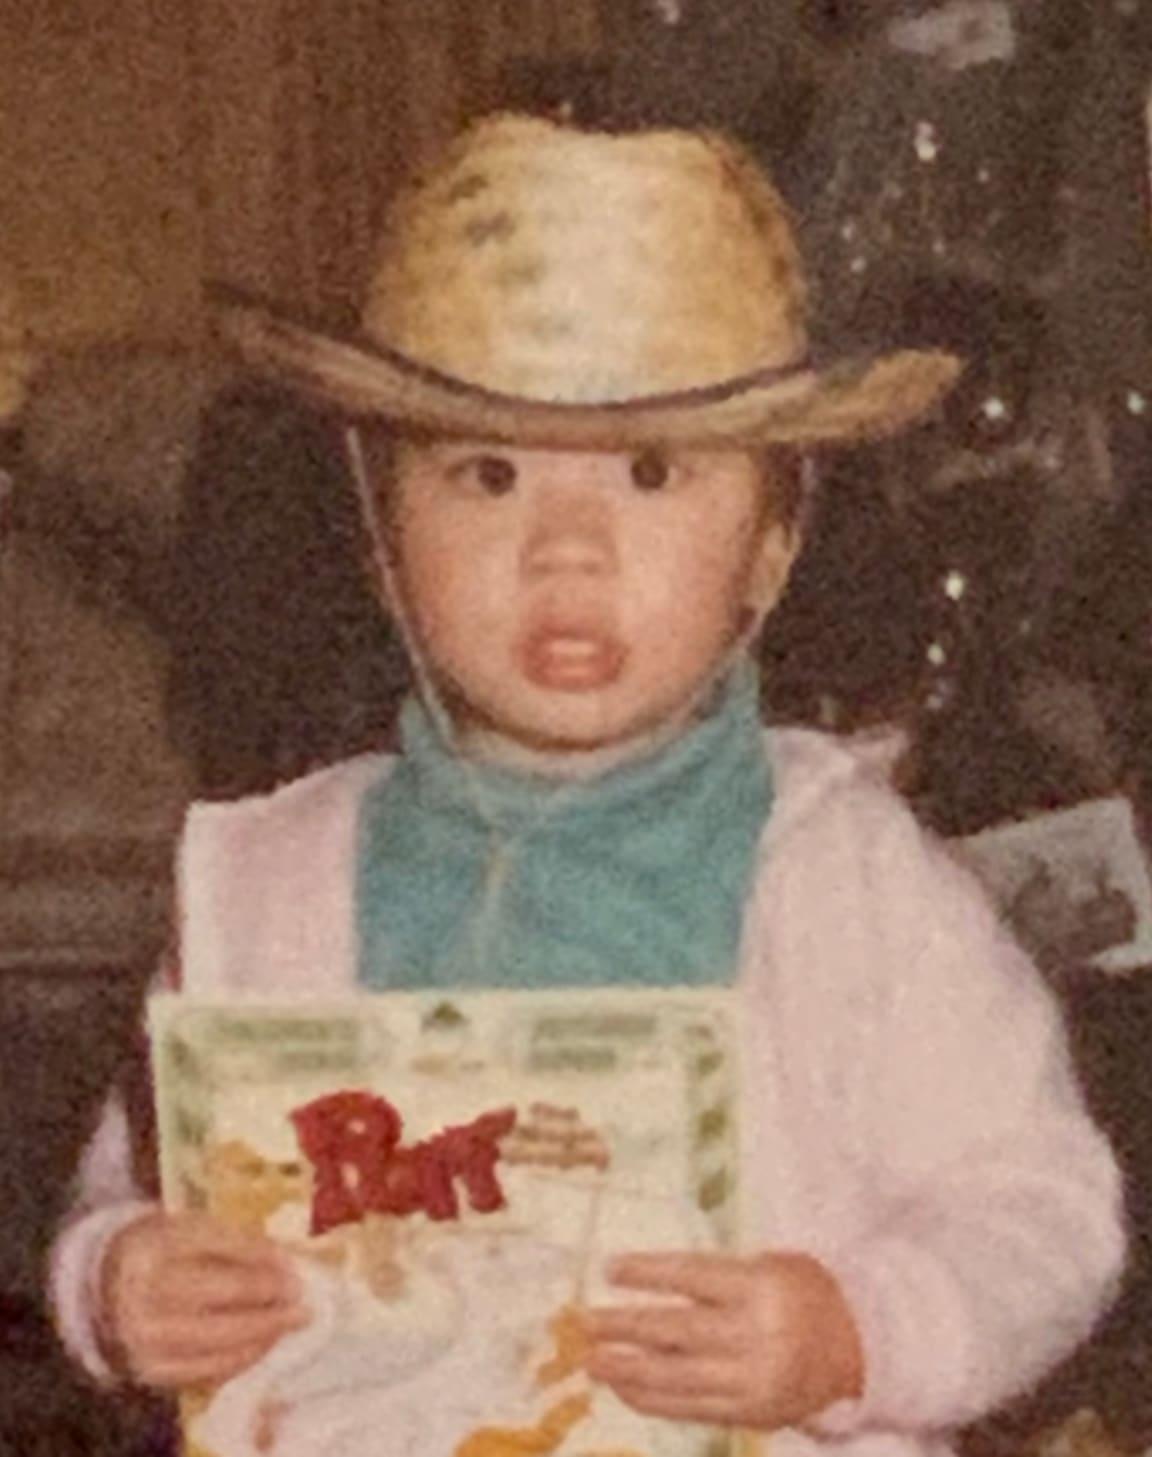 Paul as a kid